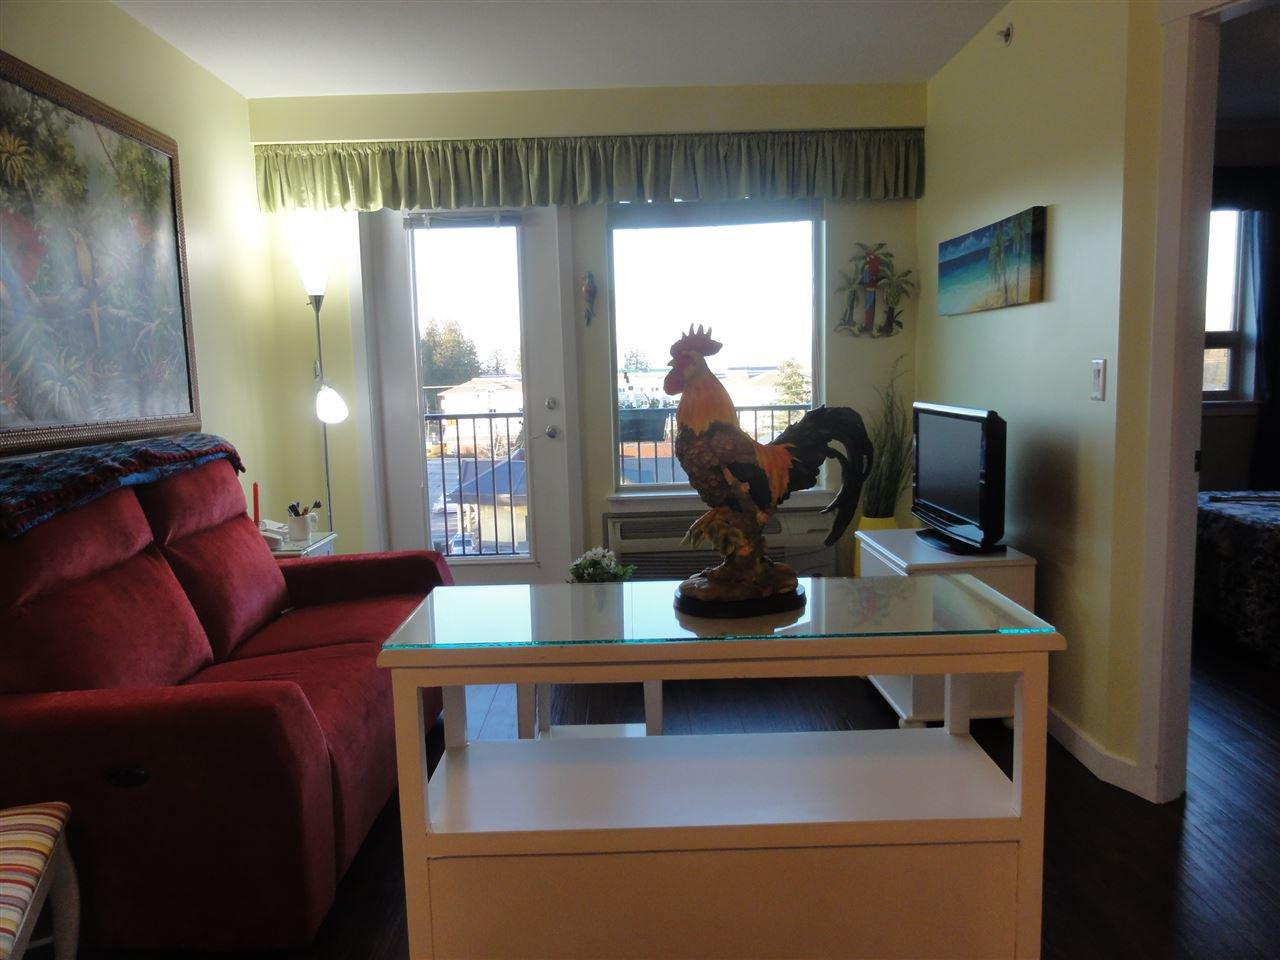 "Photo 3: Photos: 431 22323 48 Avenue in Langley: Murrayville Condo for sale in ""AVALON GARDENS"" : MLS®# R2134591"